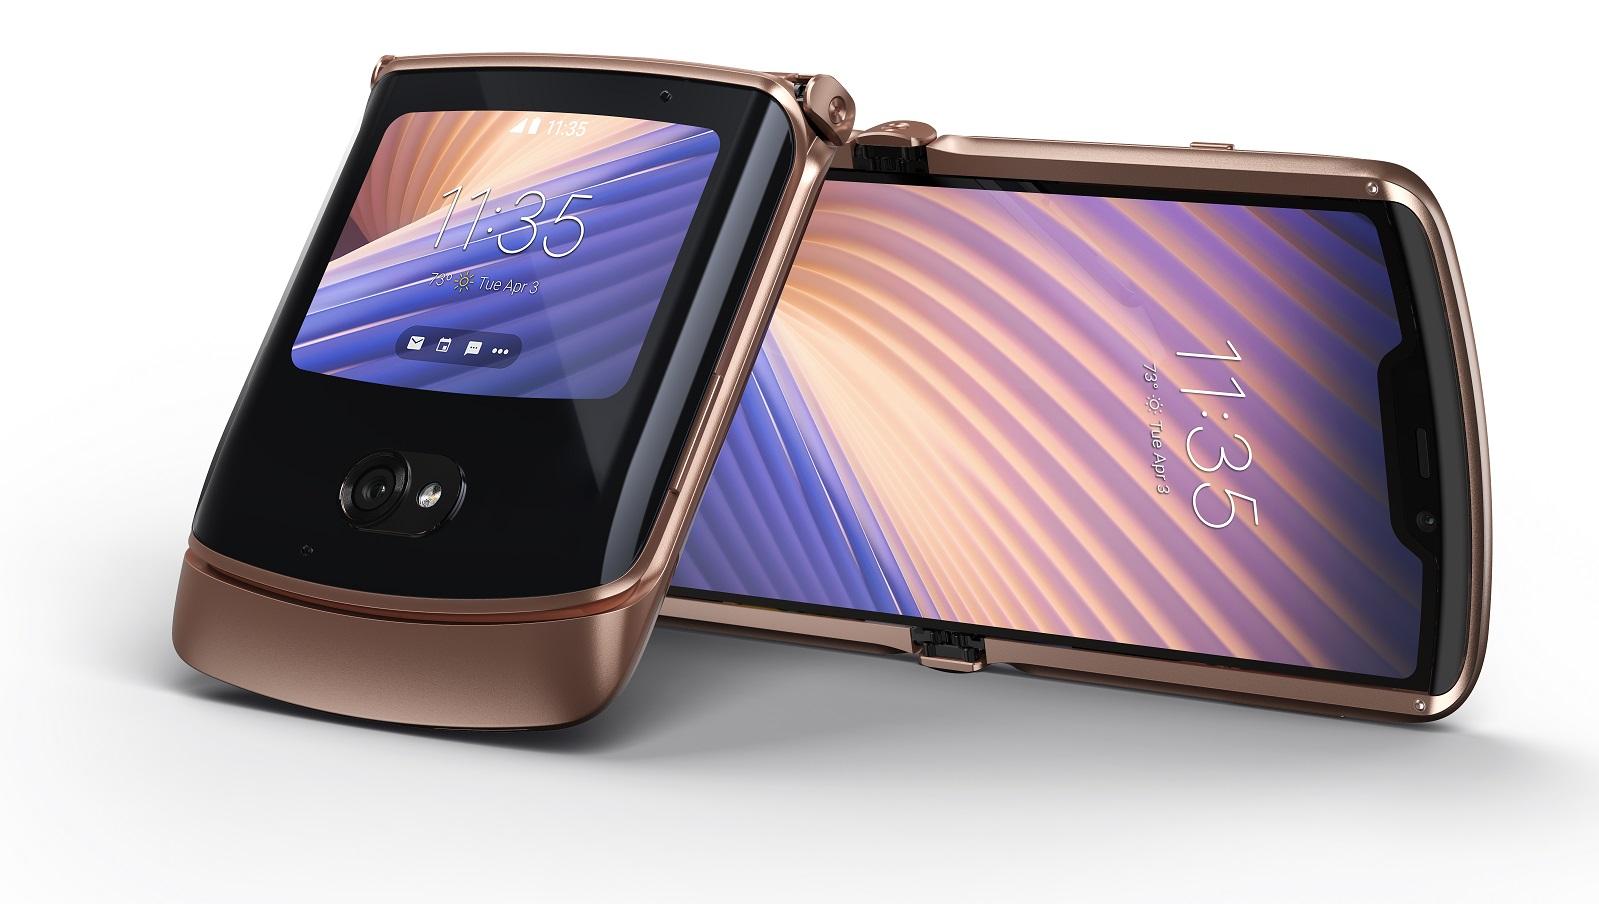 The New Motorola Razr 2020 Price Needs To Be Folded In Half To Make It A Foldable Champion Techradar